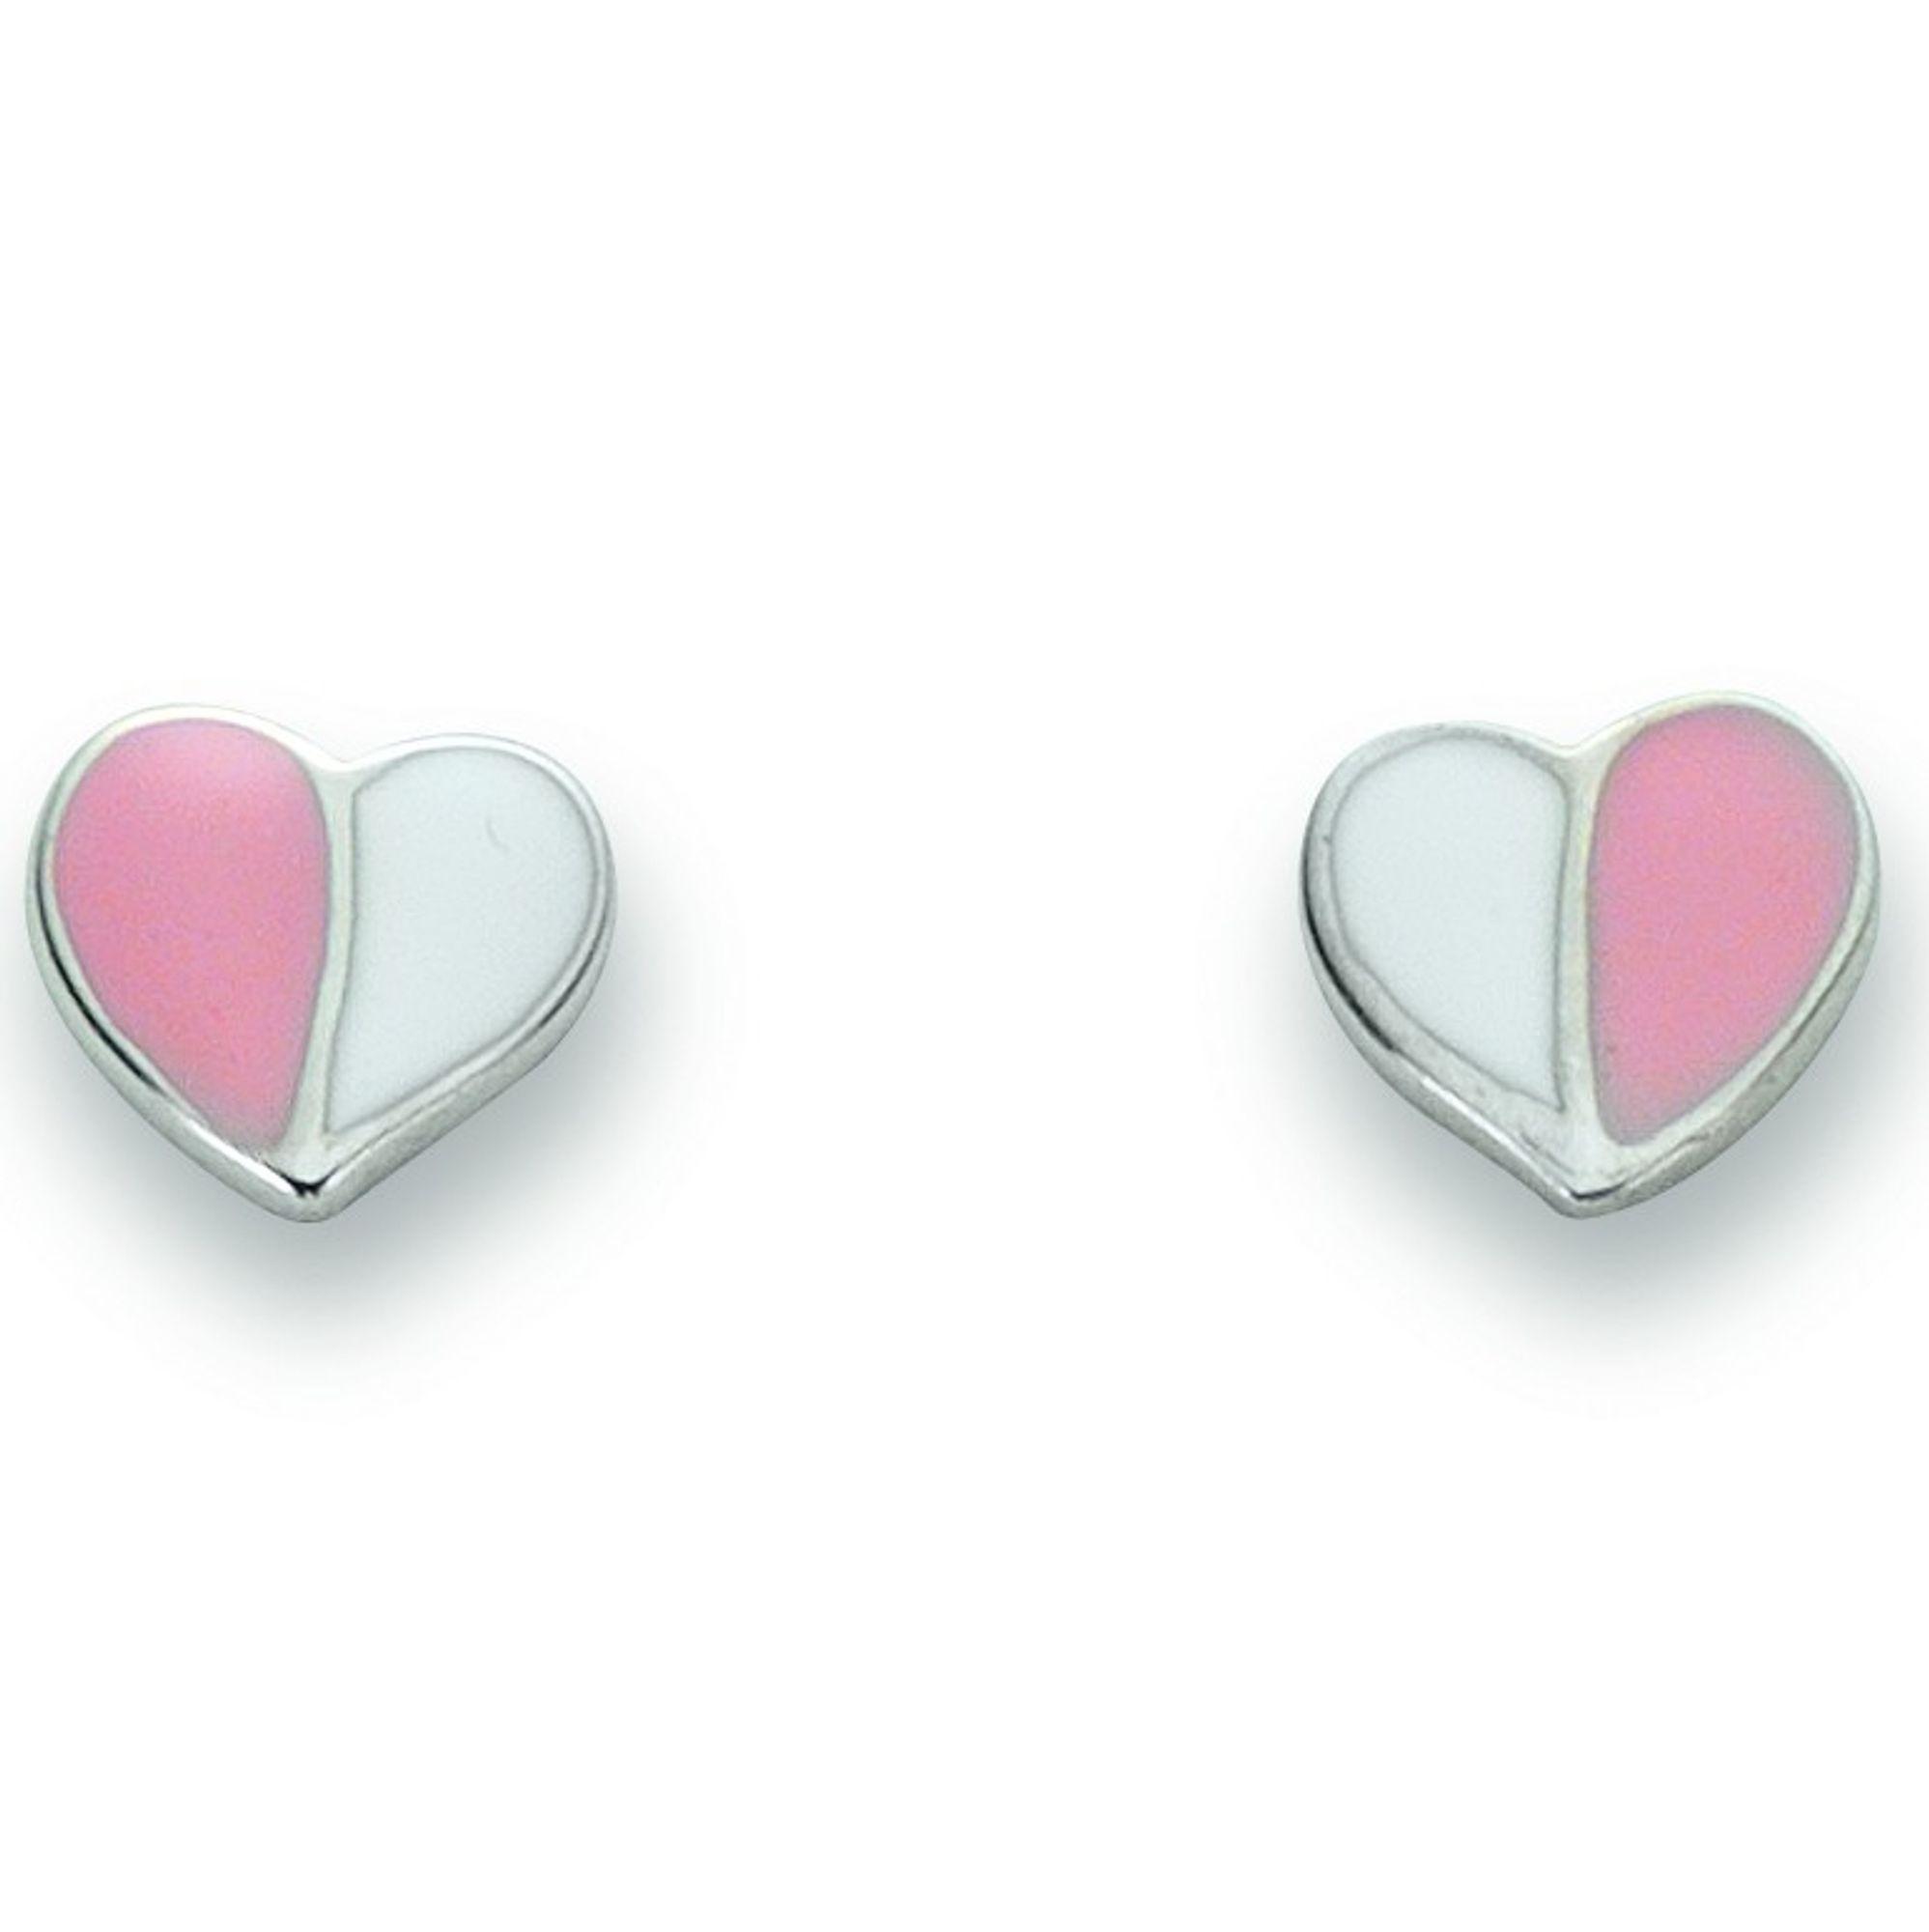 Basic Silber 01.KS101 Mädchen Ohrstecker Herz Silber rosa weiß